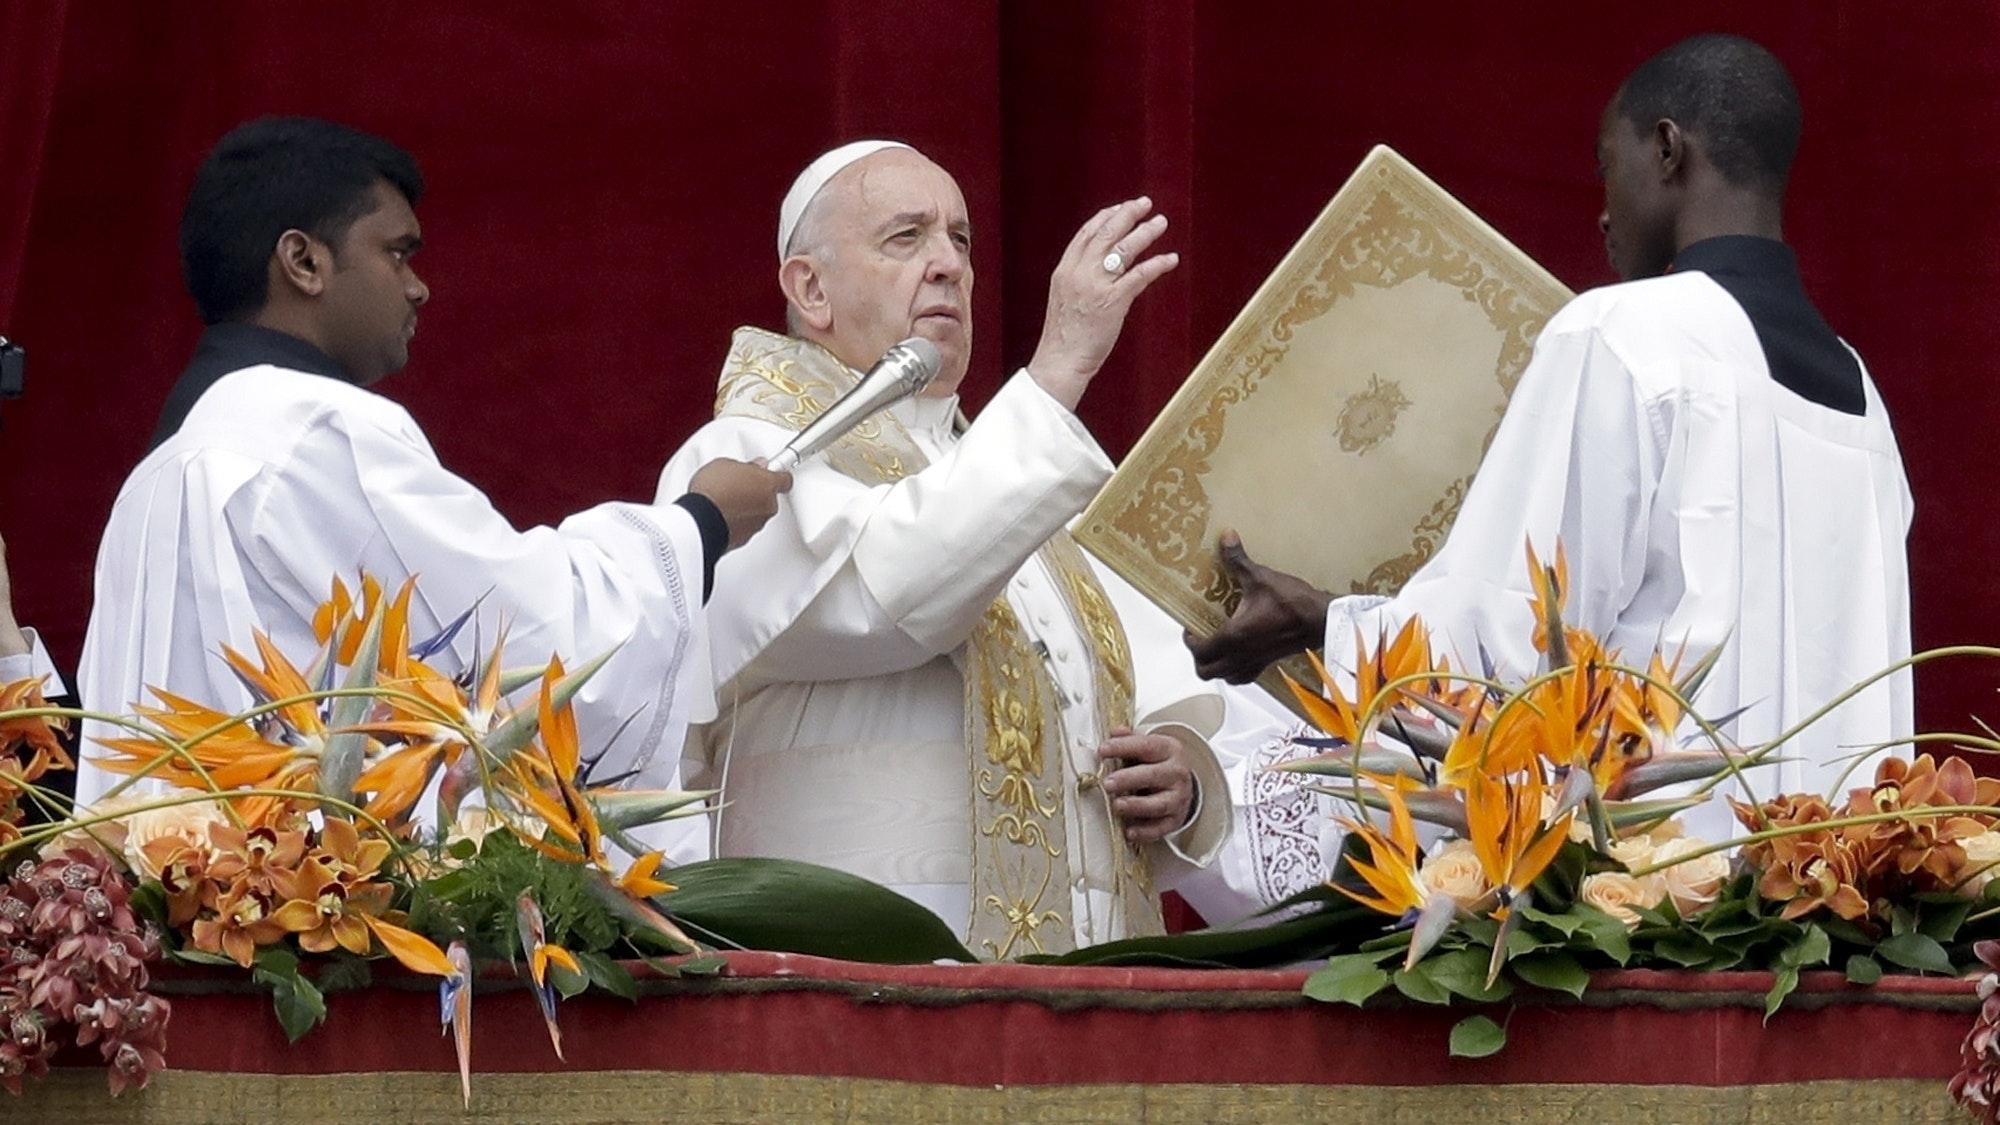 Pope Francis Remembers Sri Lanka Fallen In Easter Sunday Message | Bt regarding Liturgical Calendar In Sri Lanka